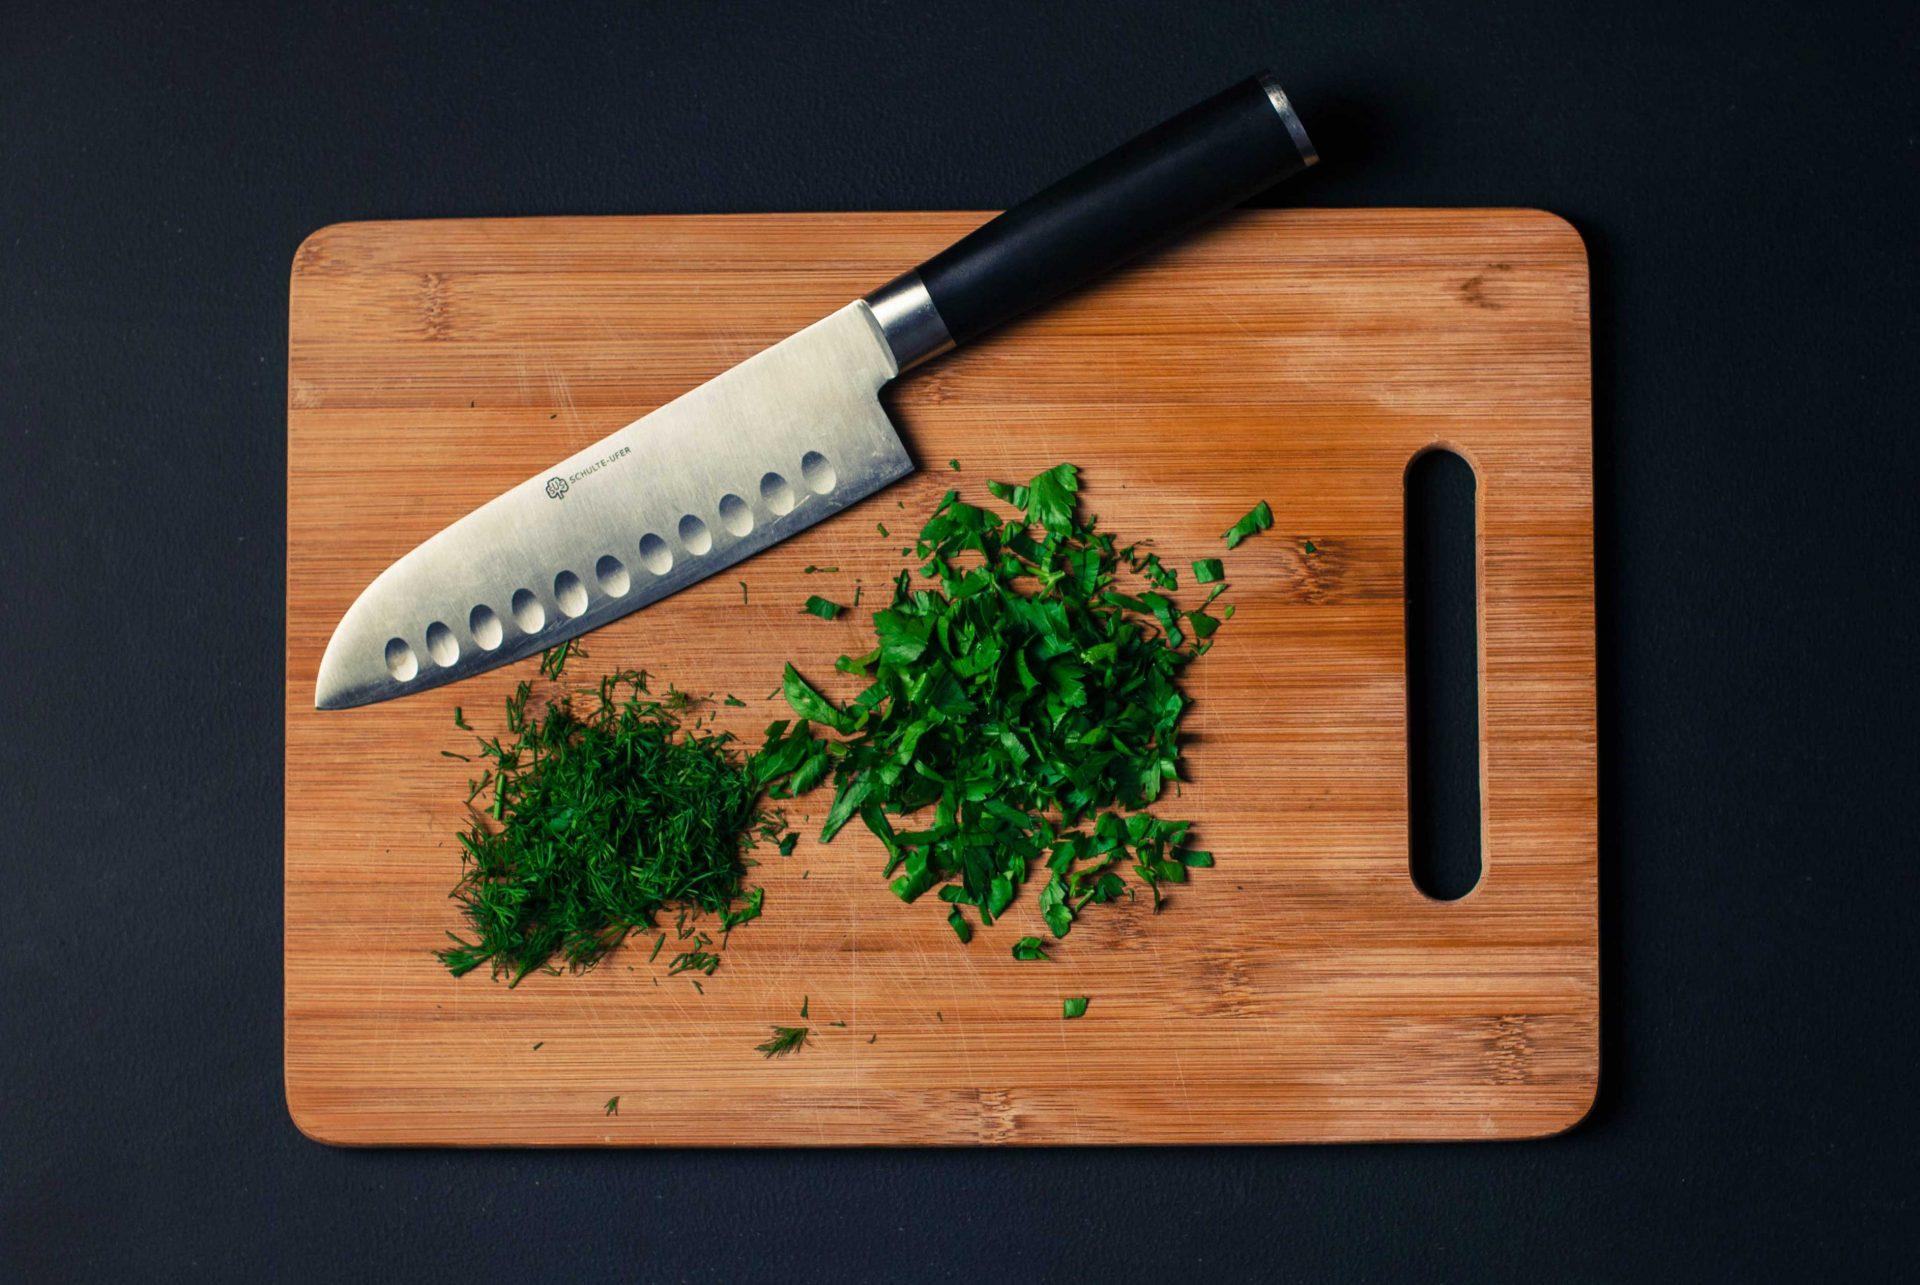 Das Küchenmesser-Phänomen: Social Recruiting in der Praxis